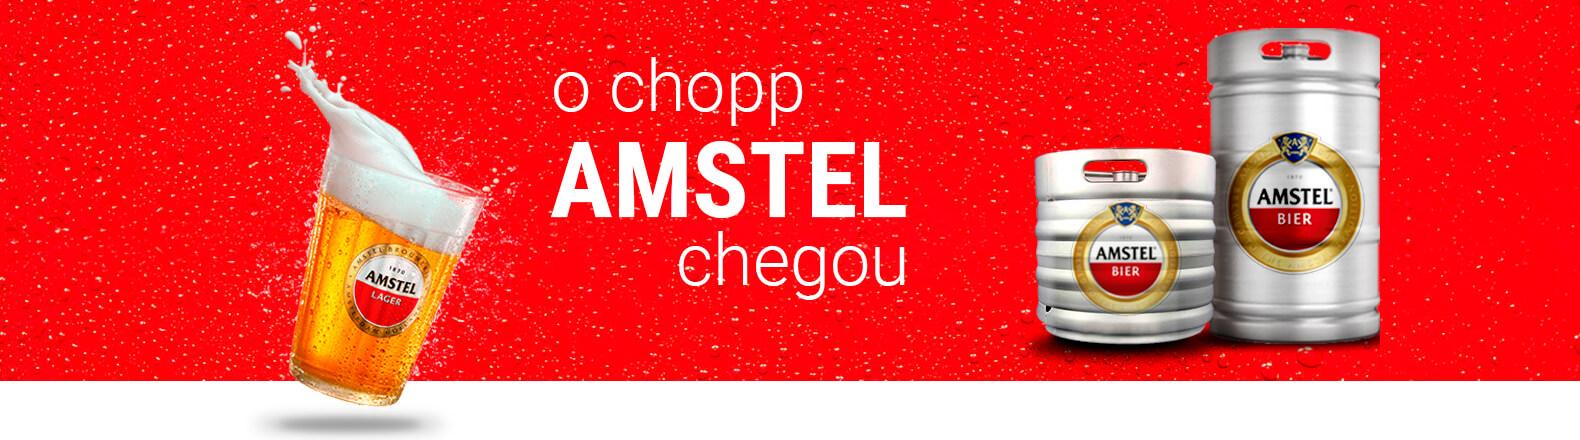 Home - Banner - Amstel